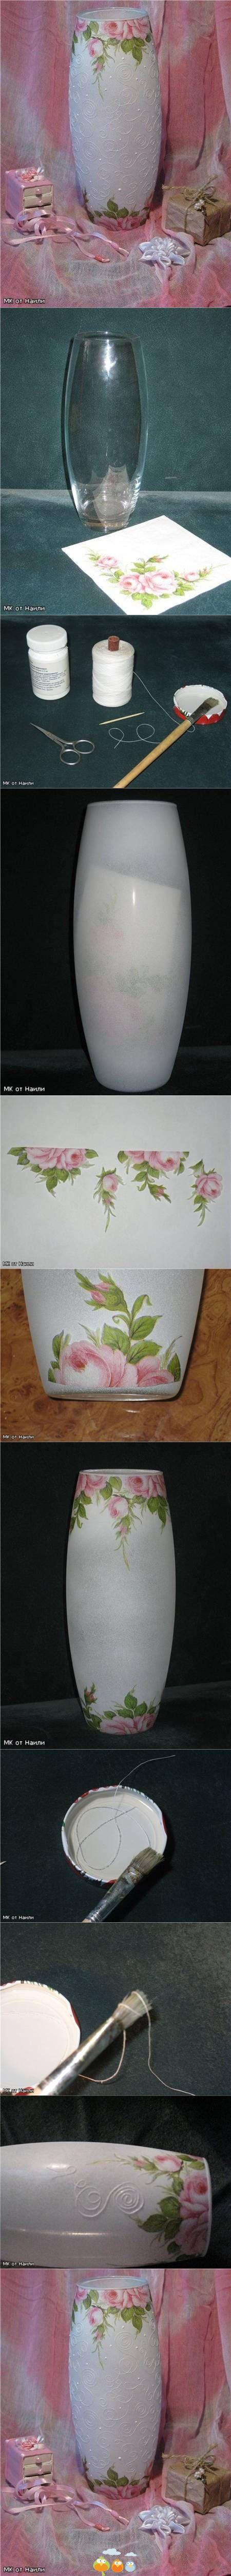 Very pretty vase